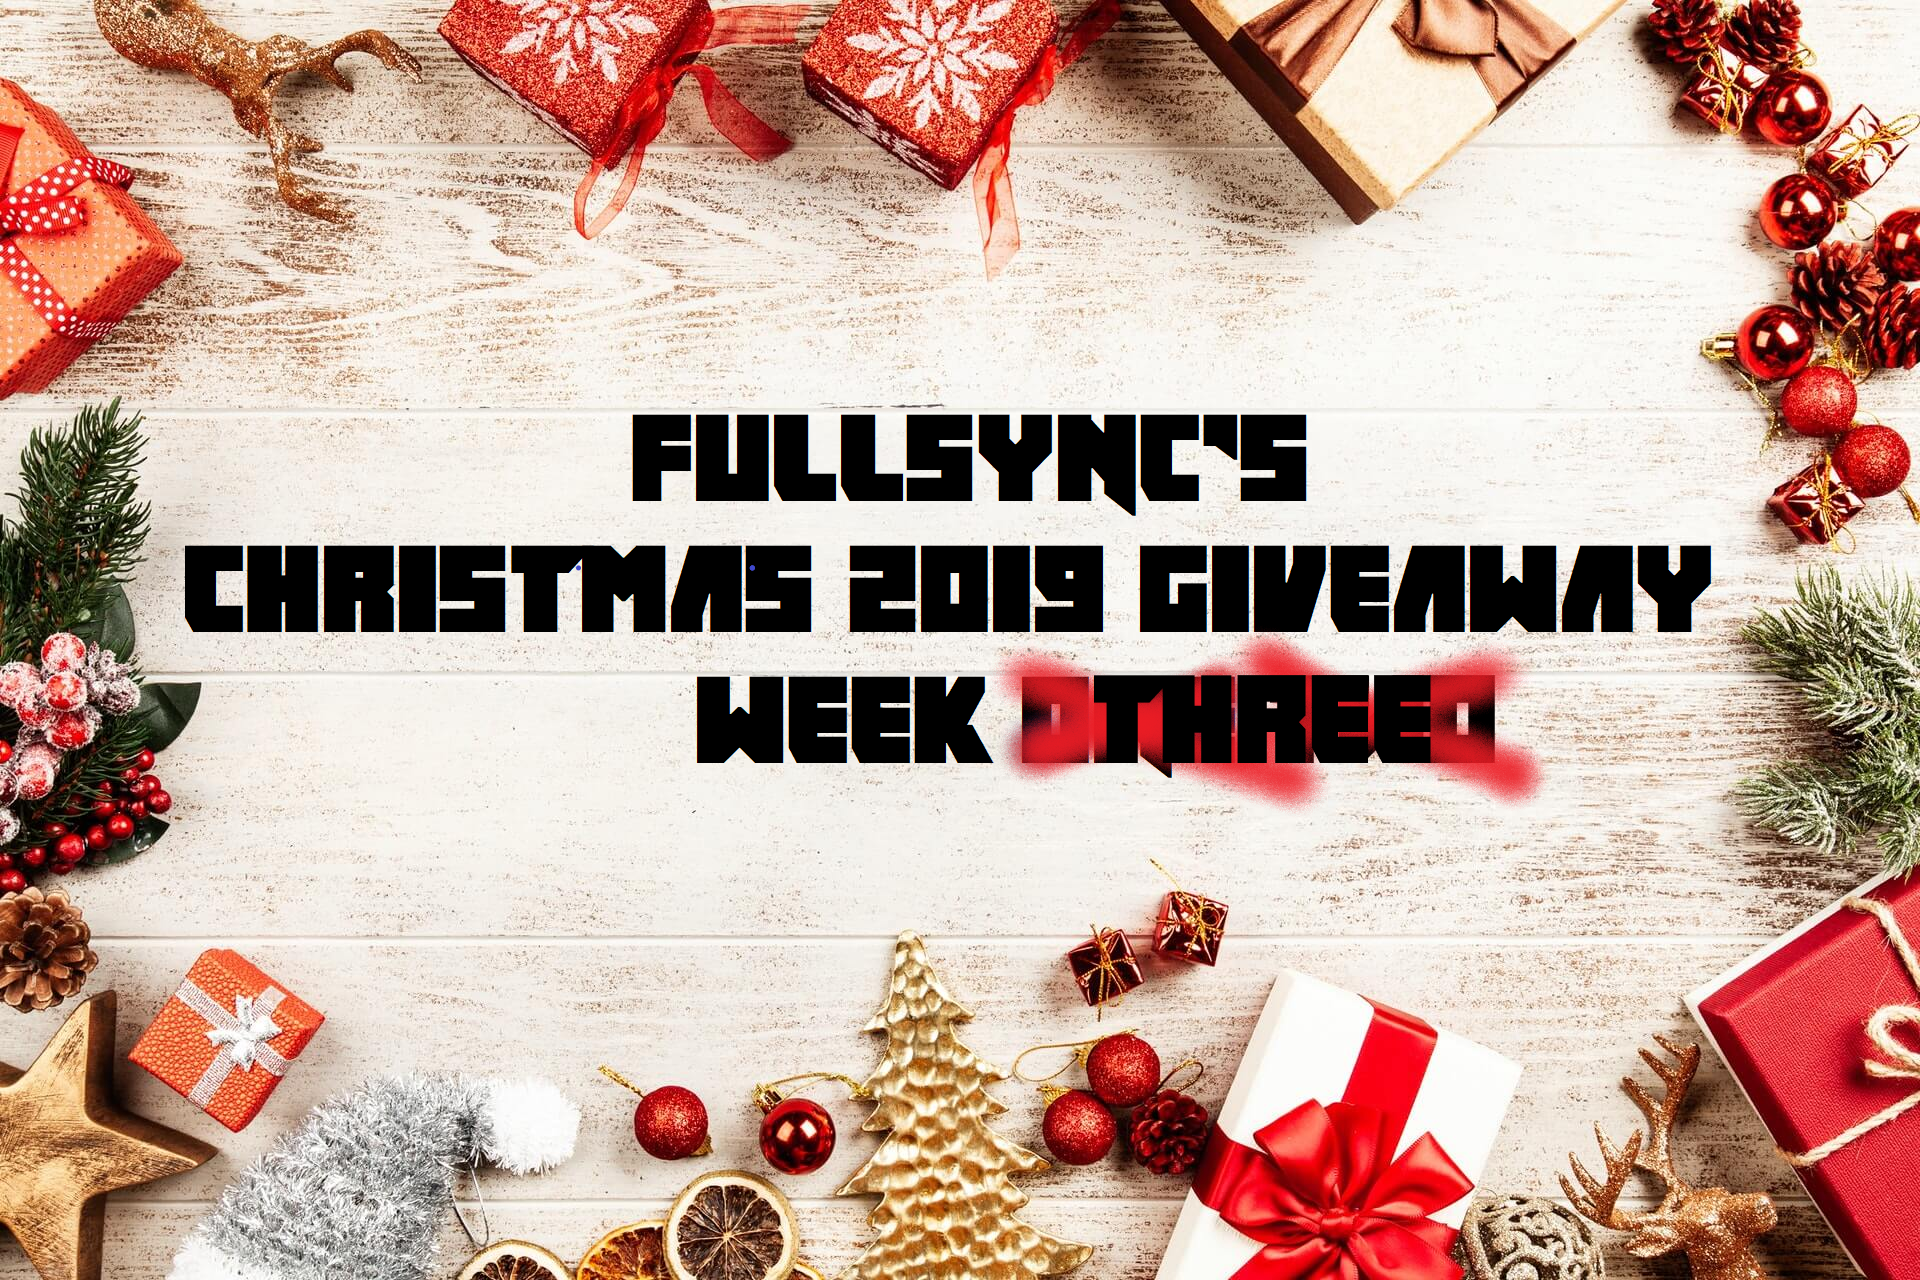 Christmas Giveaway Week Three